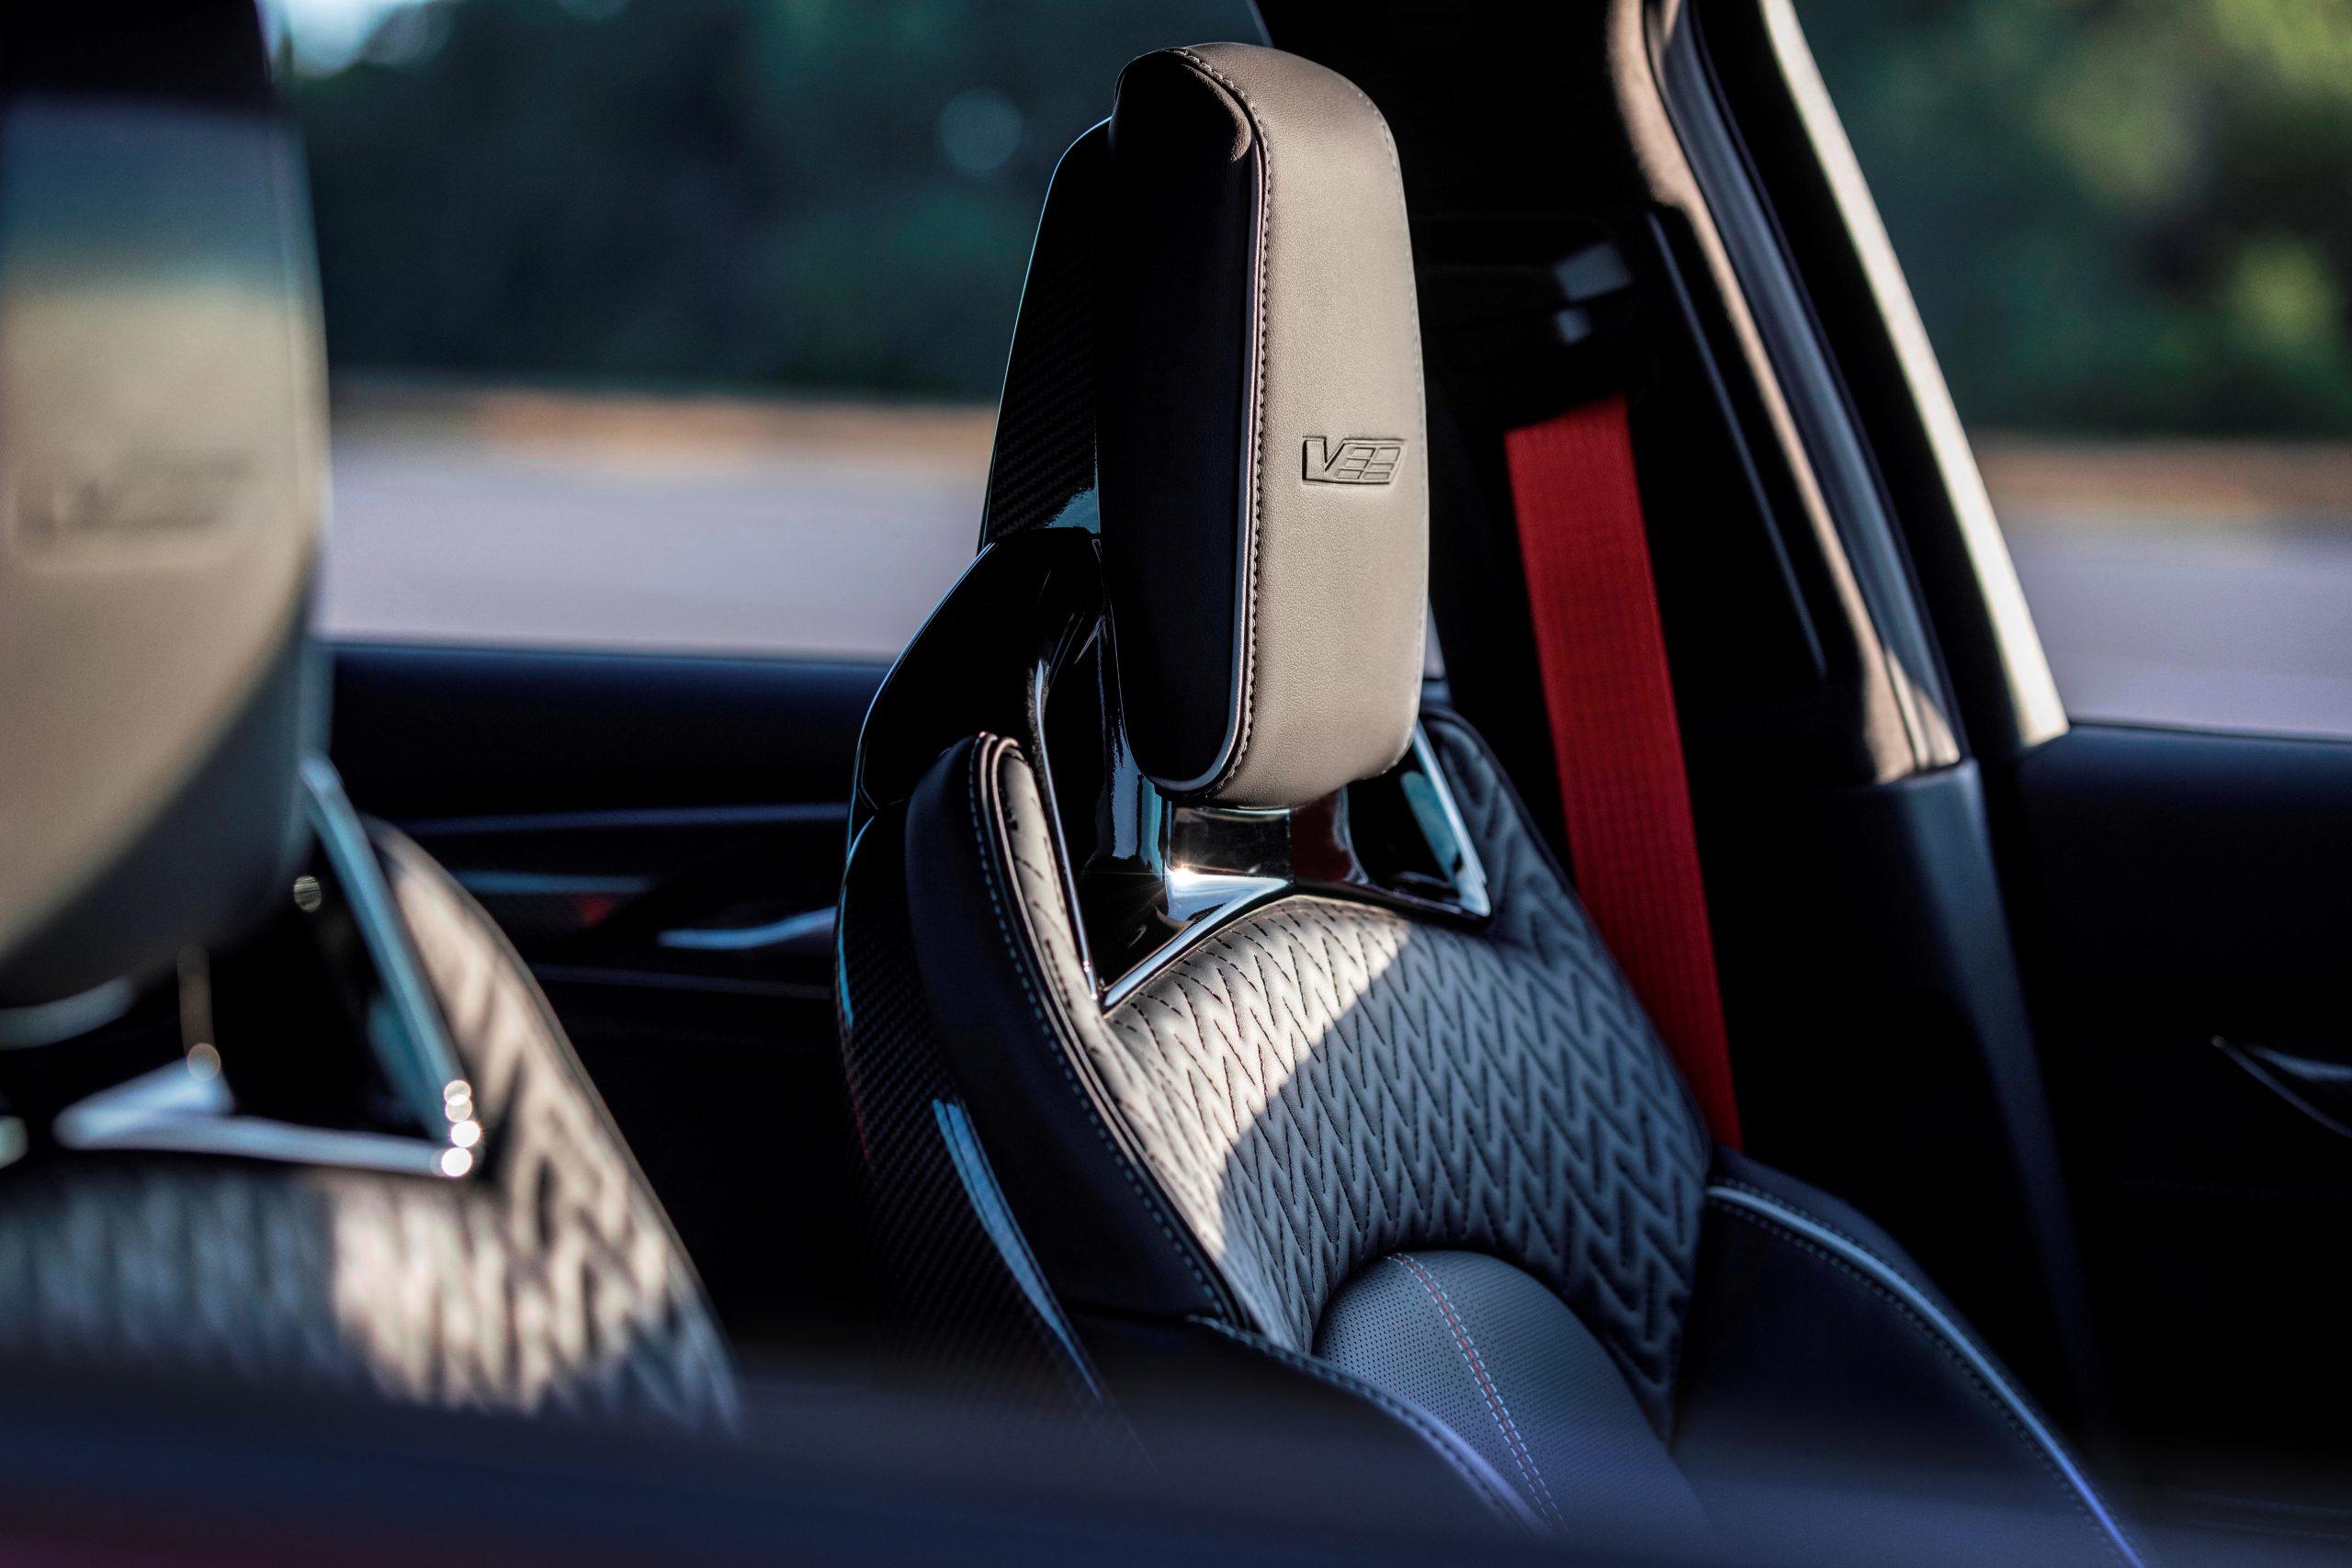 2022 Cadillac CT5-V Blackwing interior carbon fiber seat back